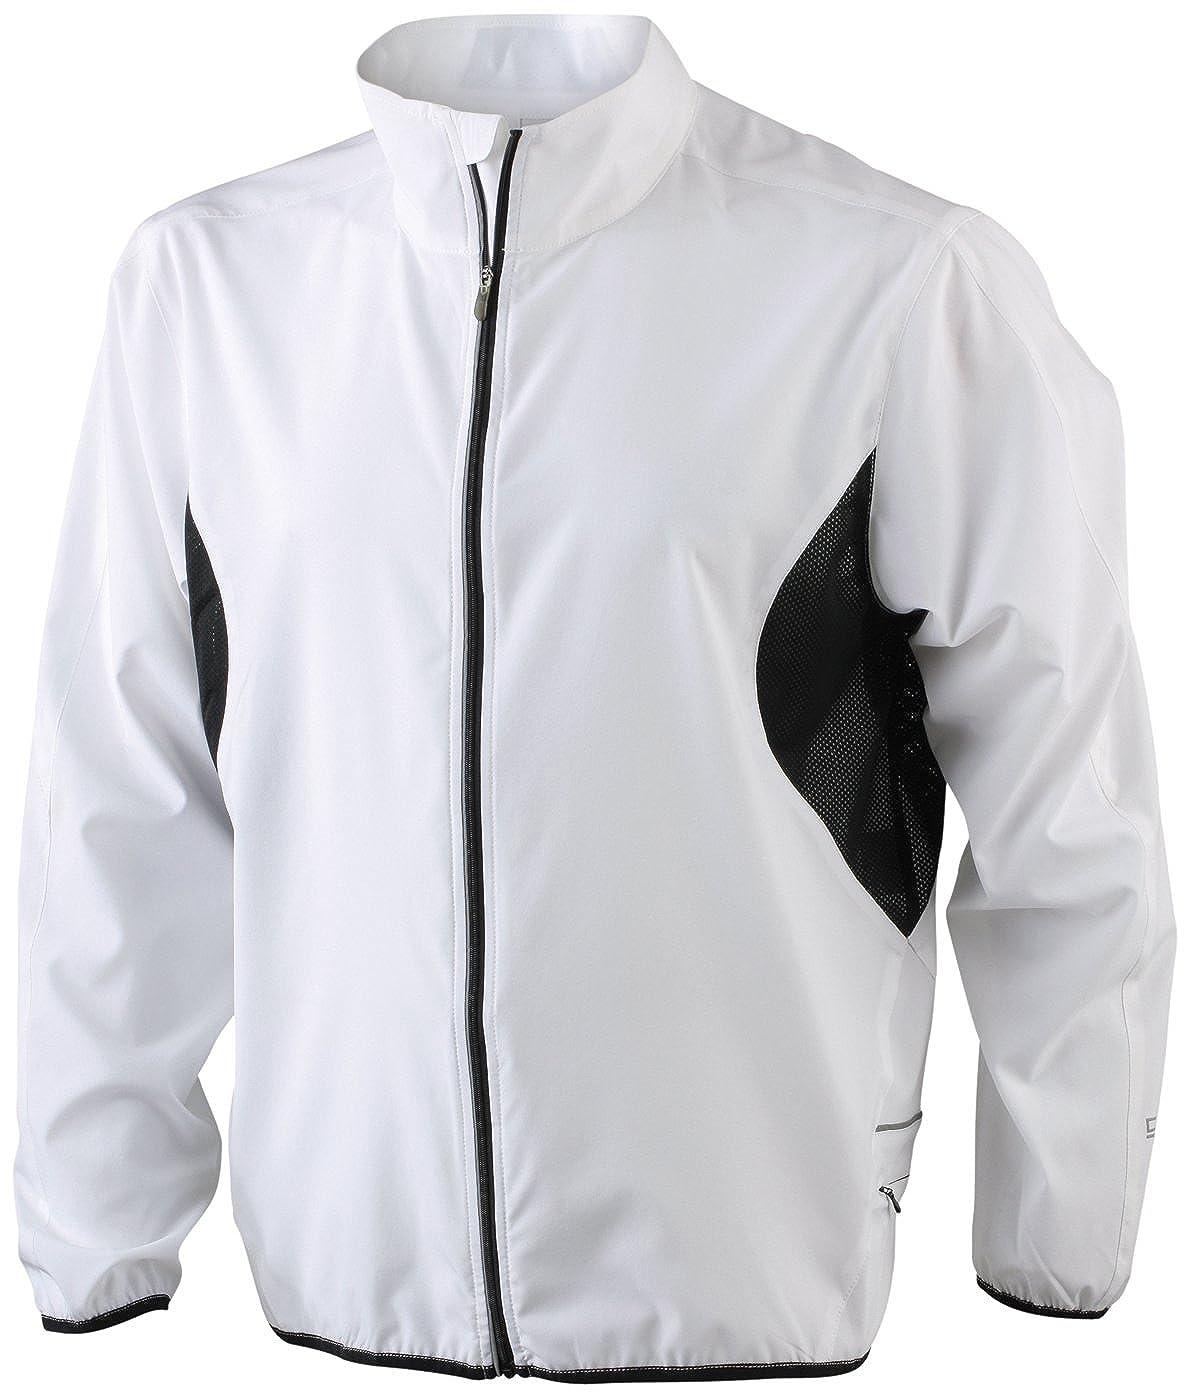 James & Nicholson - Chaqueta de running para hombre, color blanco, talla M JN444